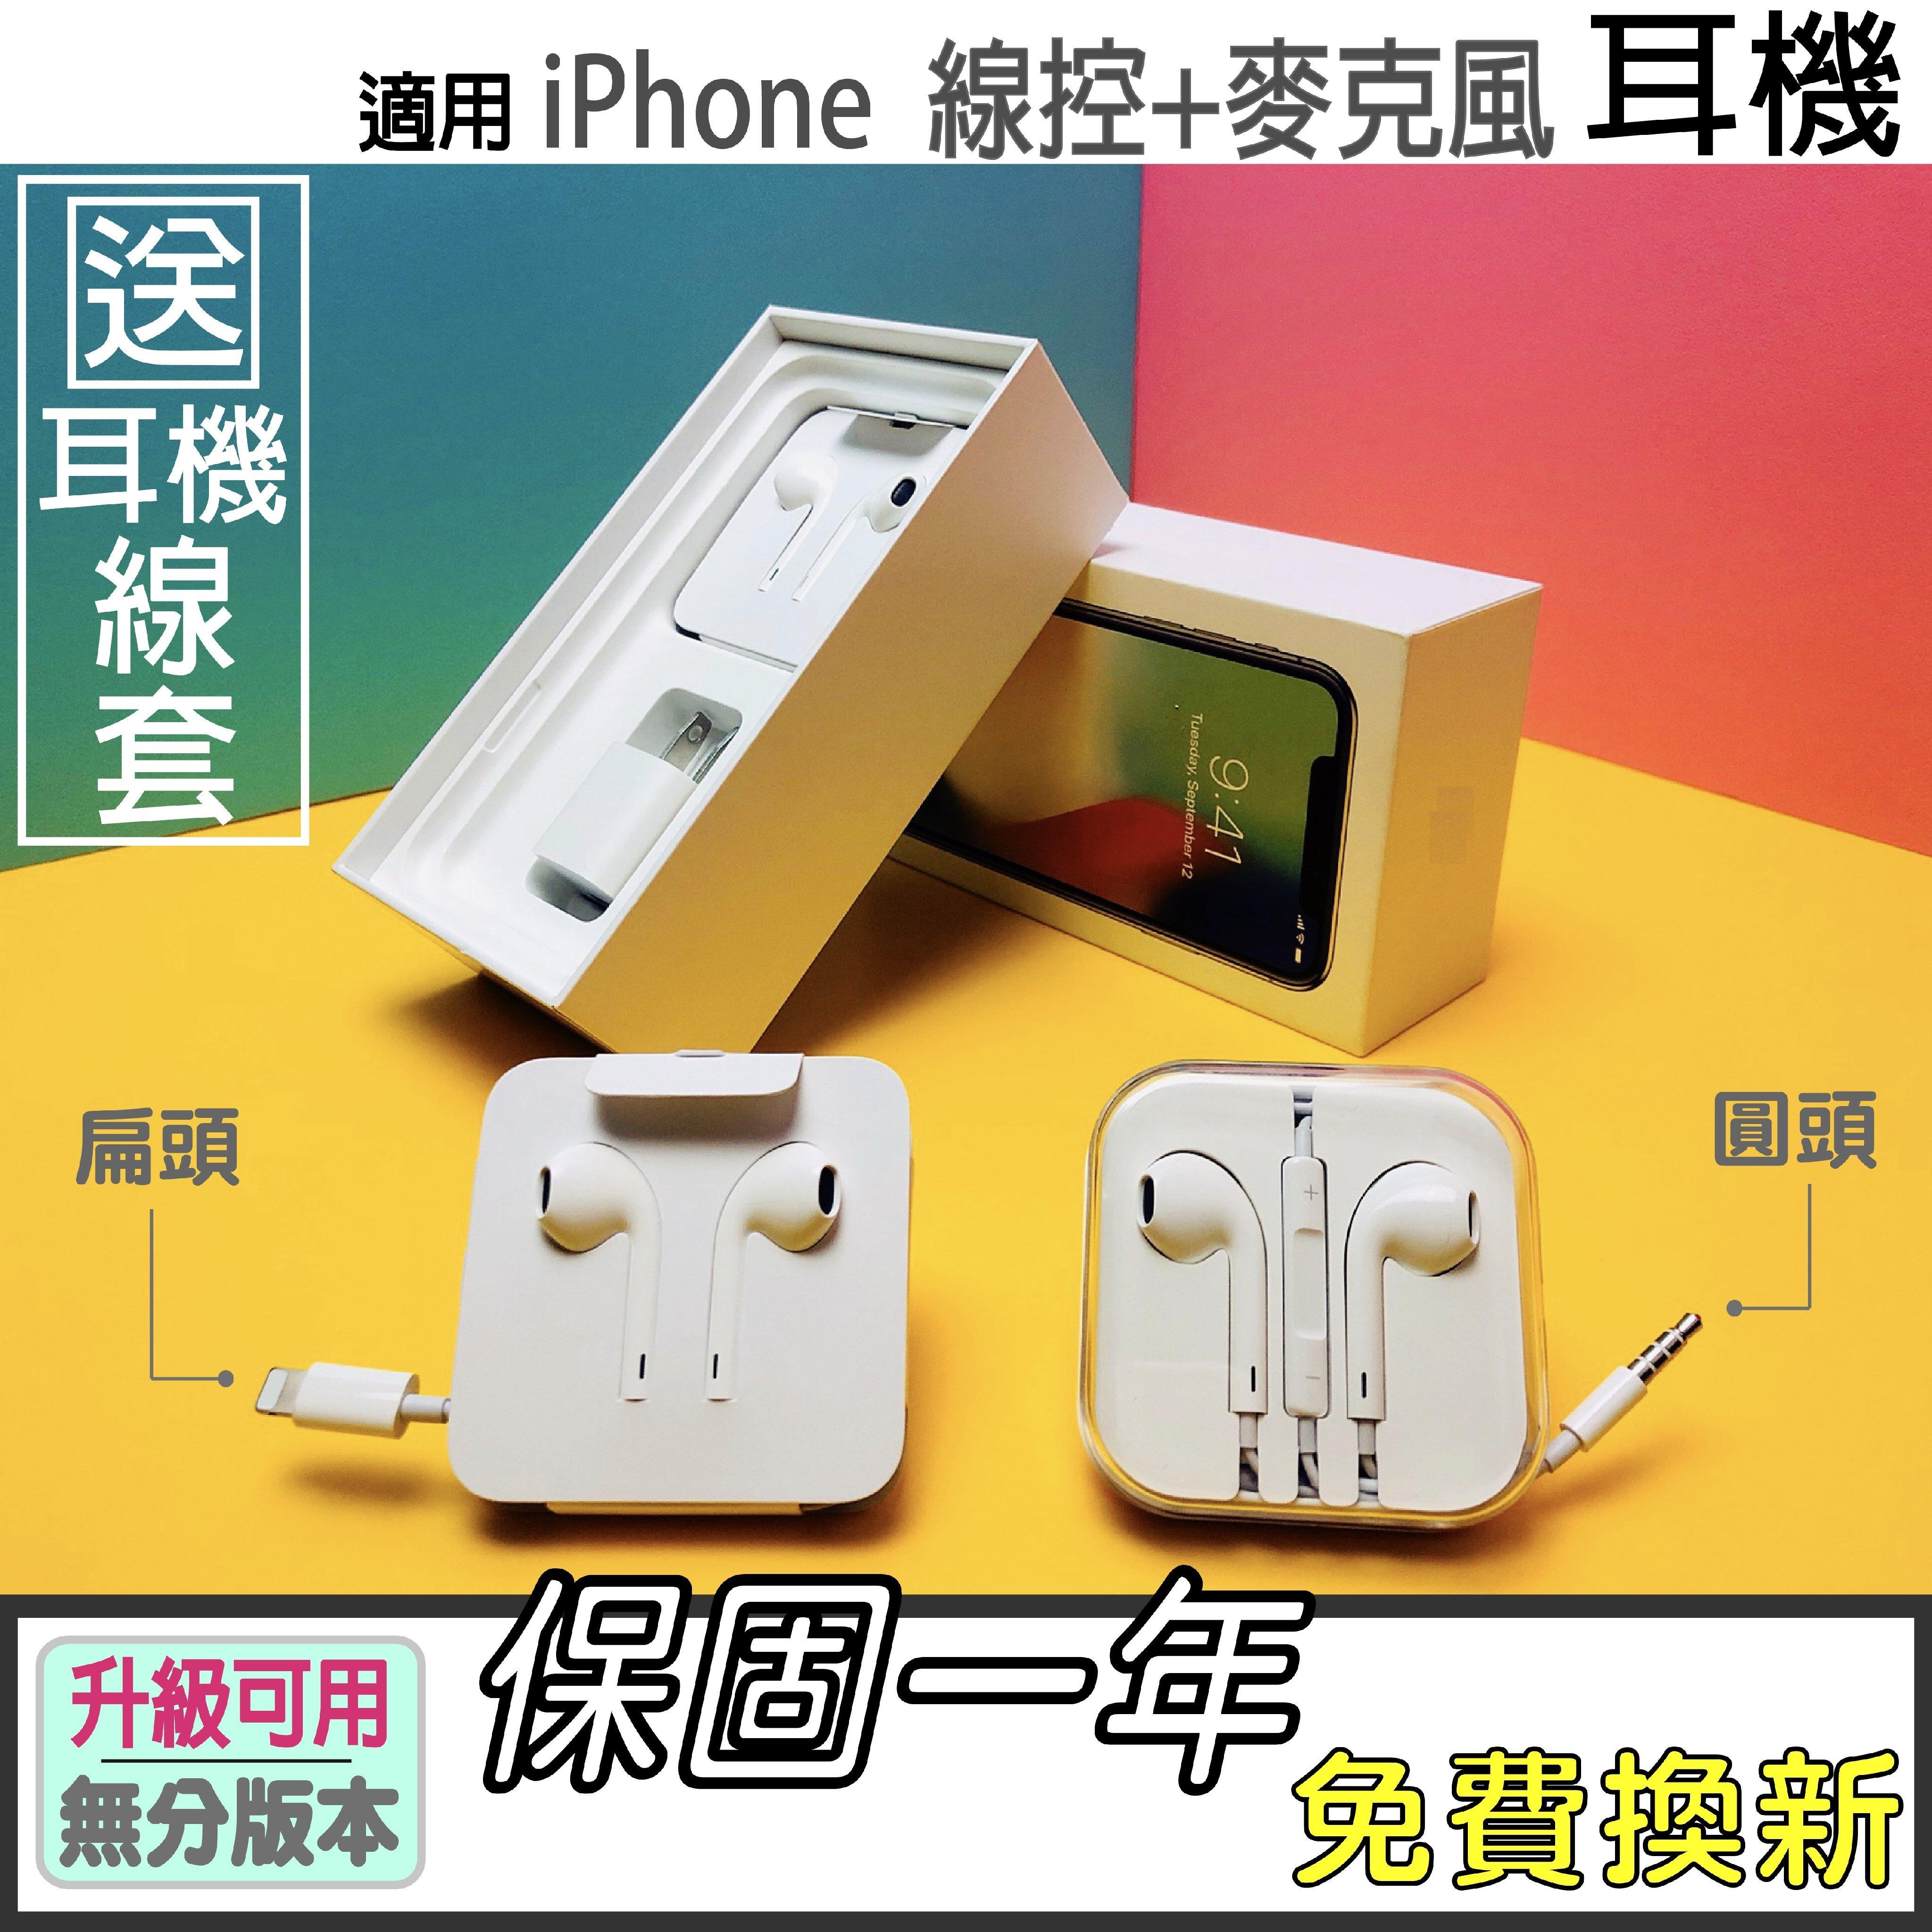 iPhone 線控+麥克風 耳機 (扁頭) 12 11 Xs 8 7 6 6S plus 5S 皆適用 保證原廠品質